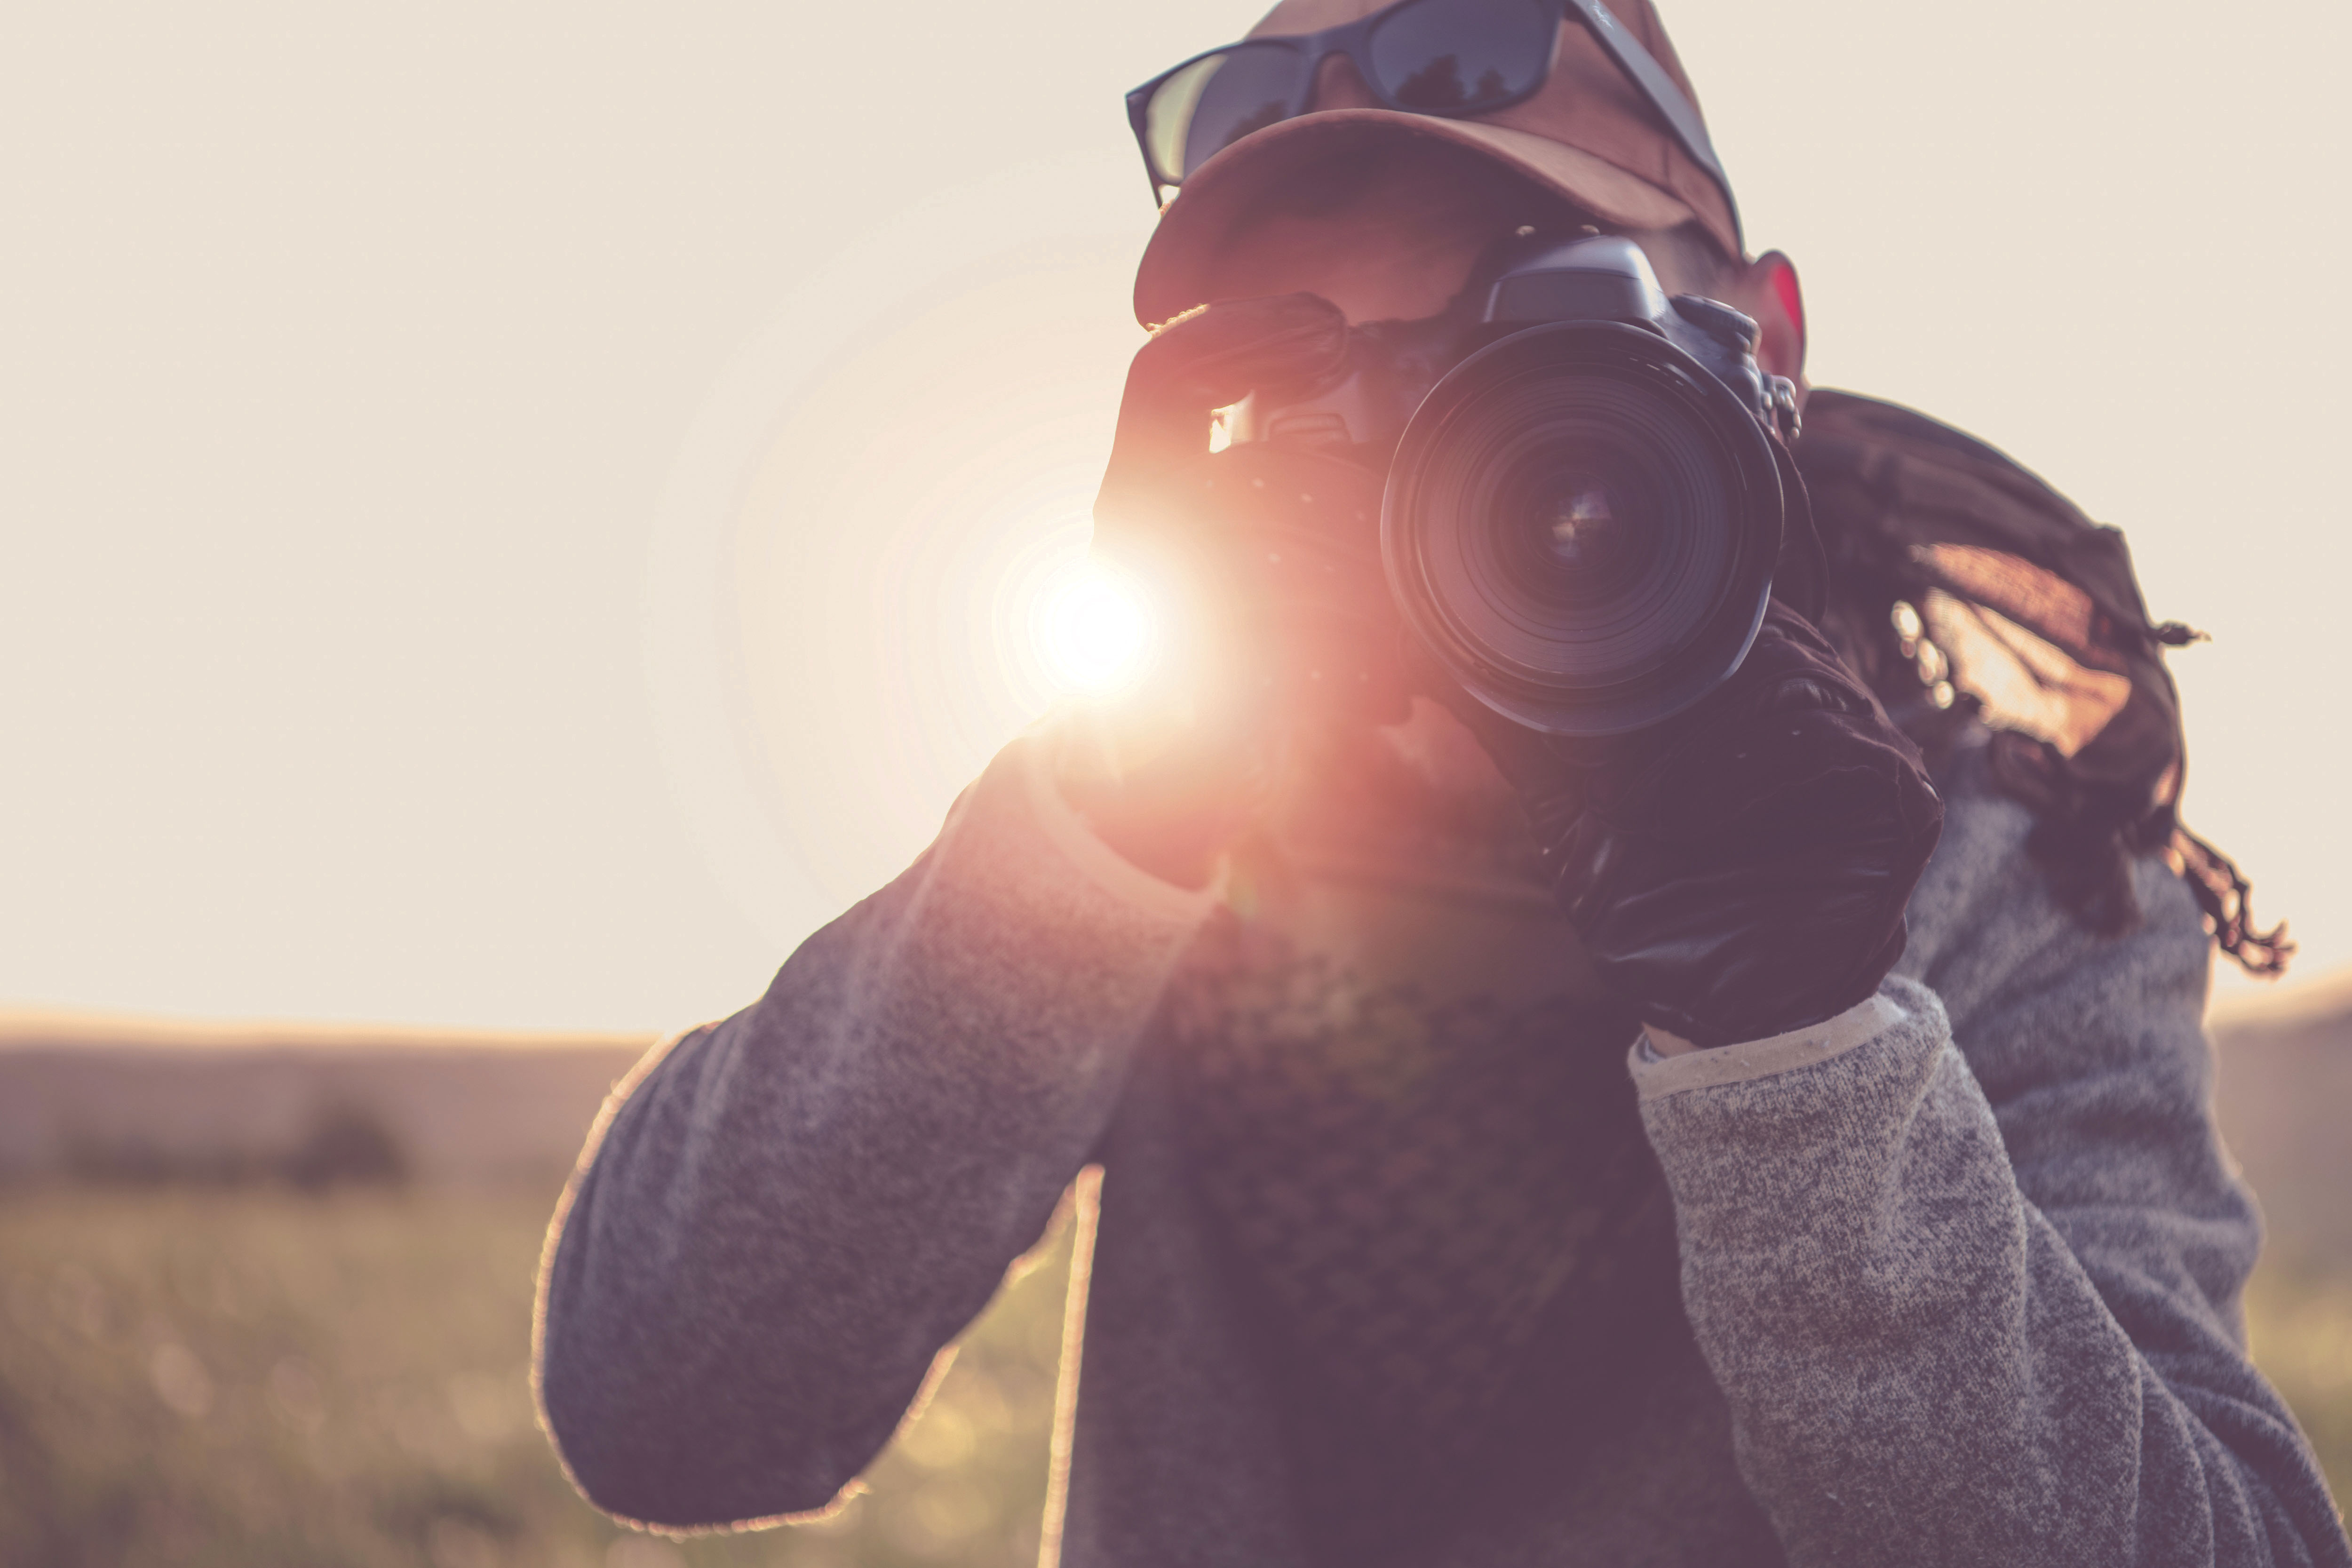 Press Photographer With Camera